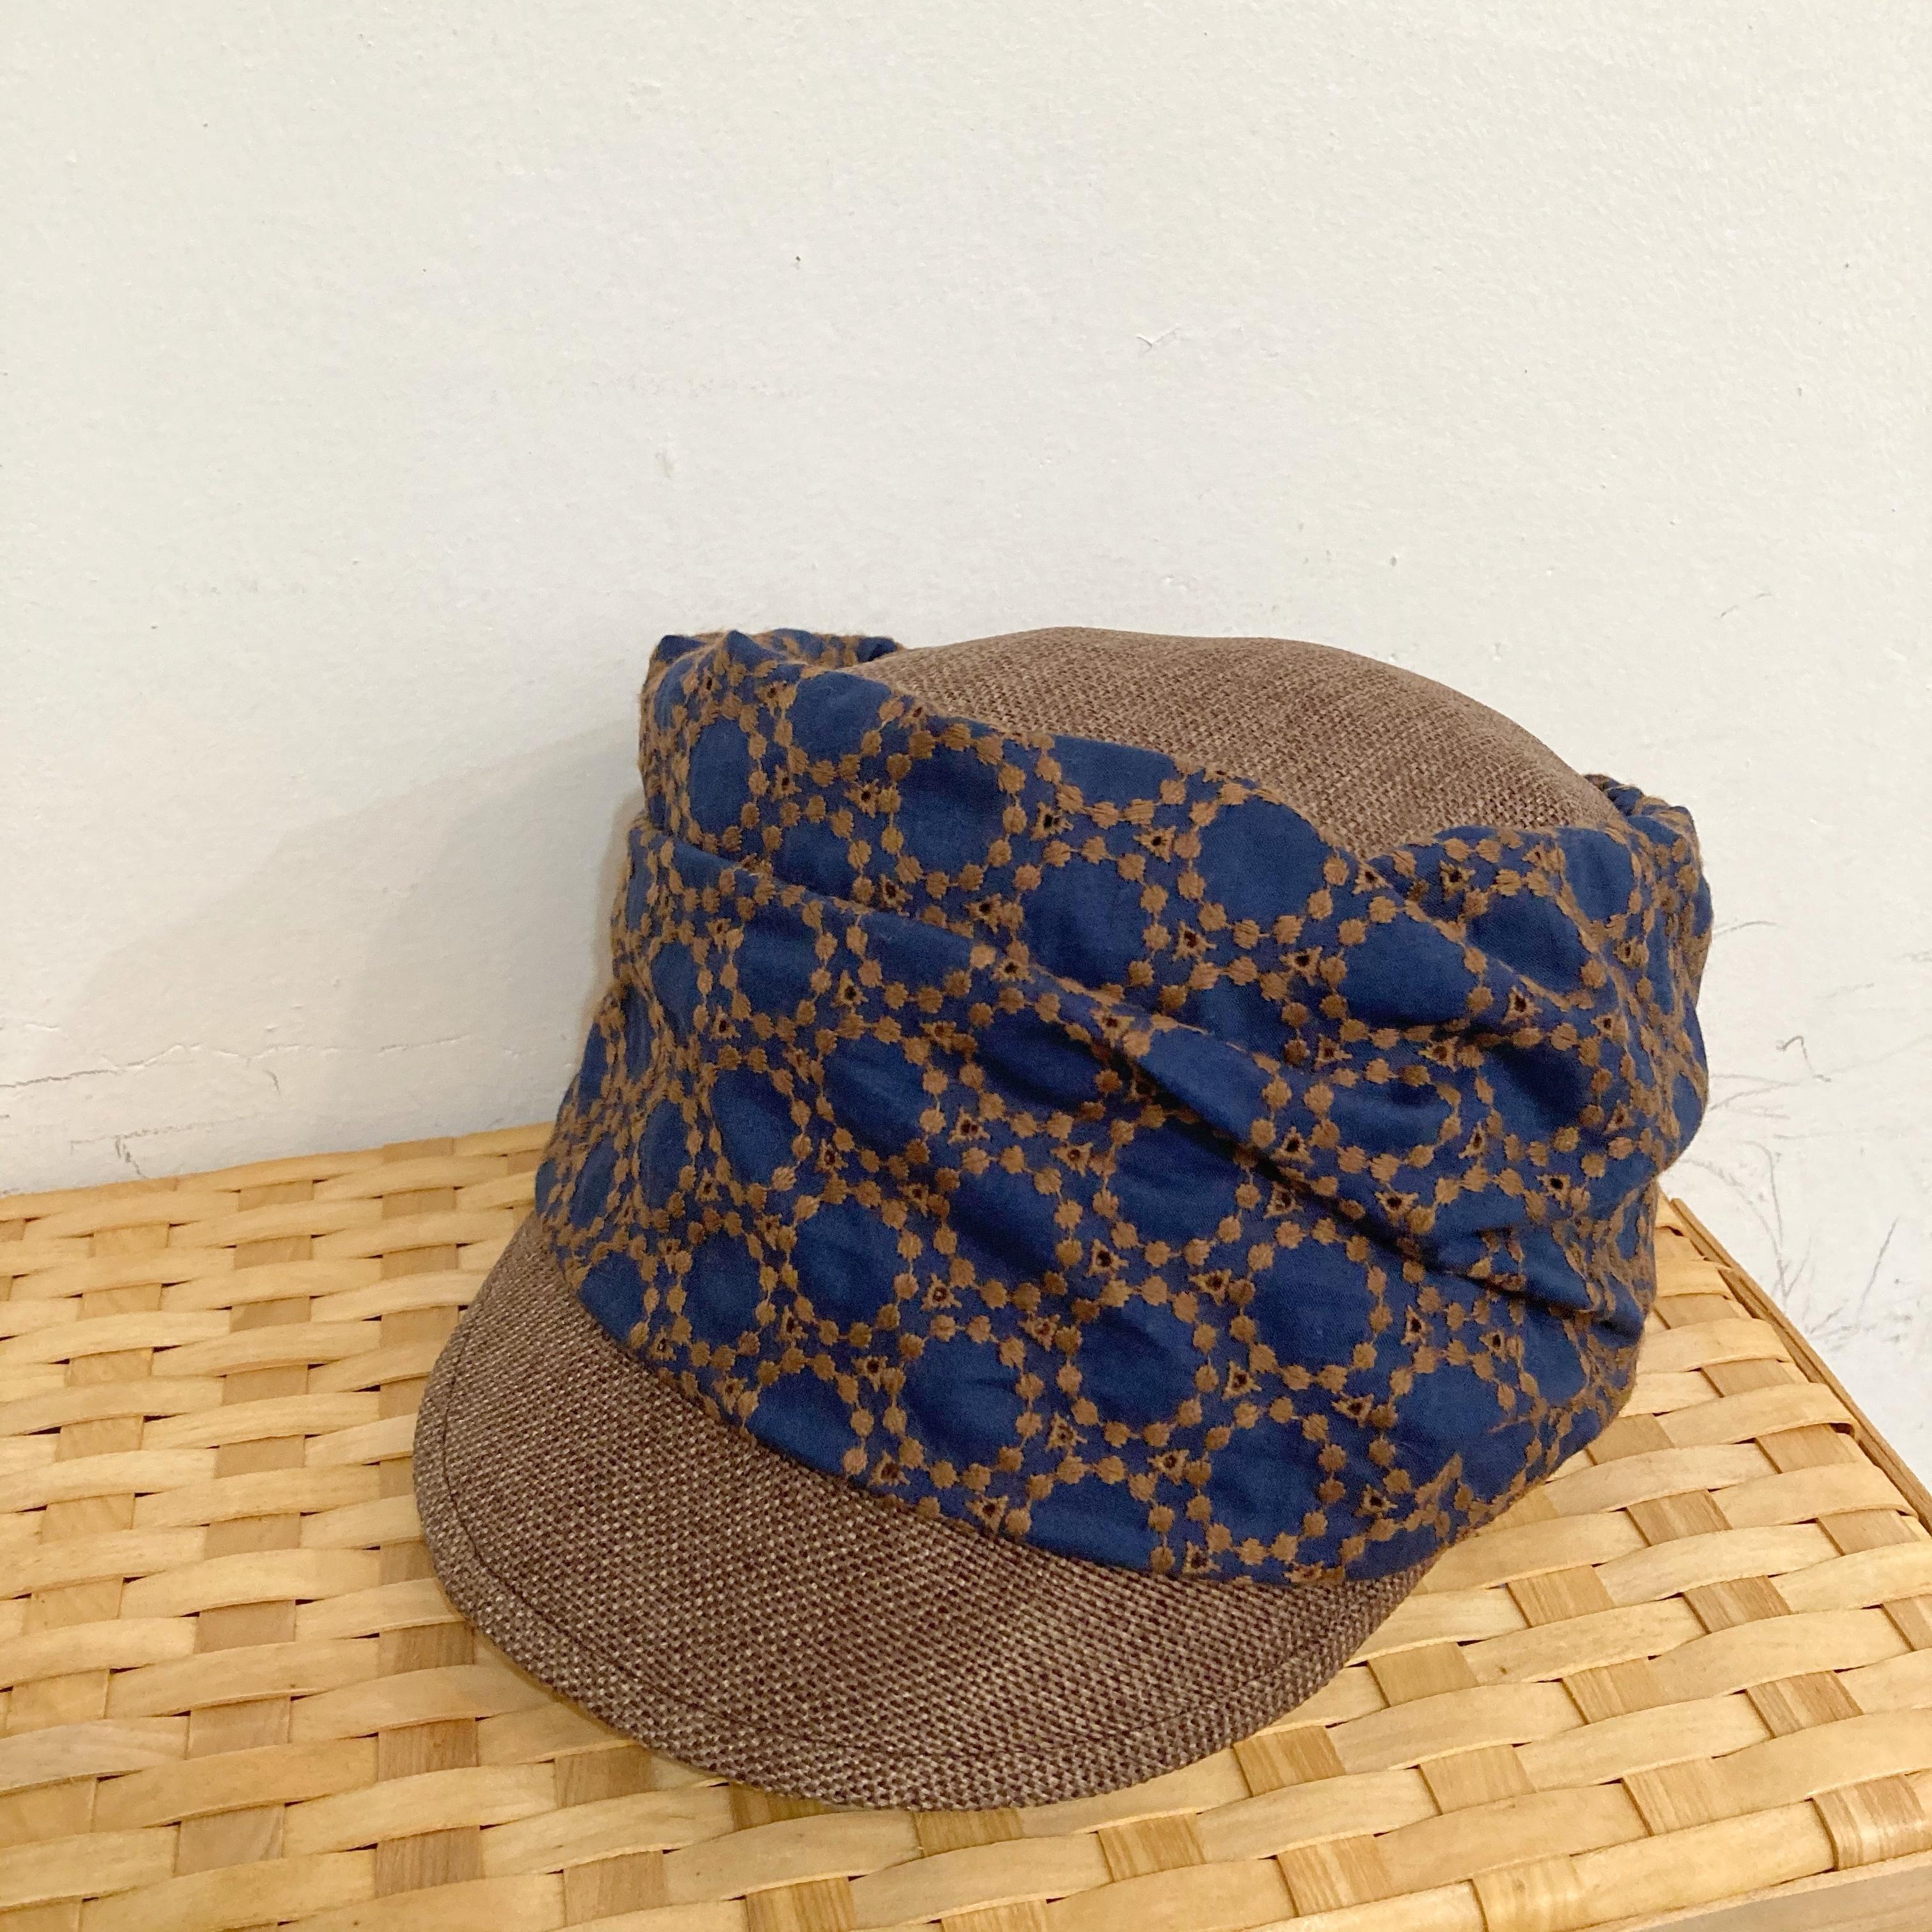 【LuLu de chapeau】キャップ帽(ネイビーブラウン)